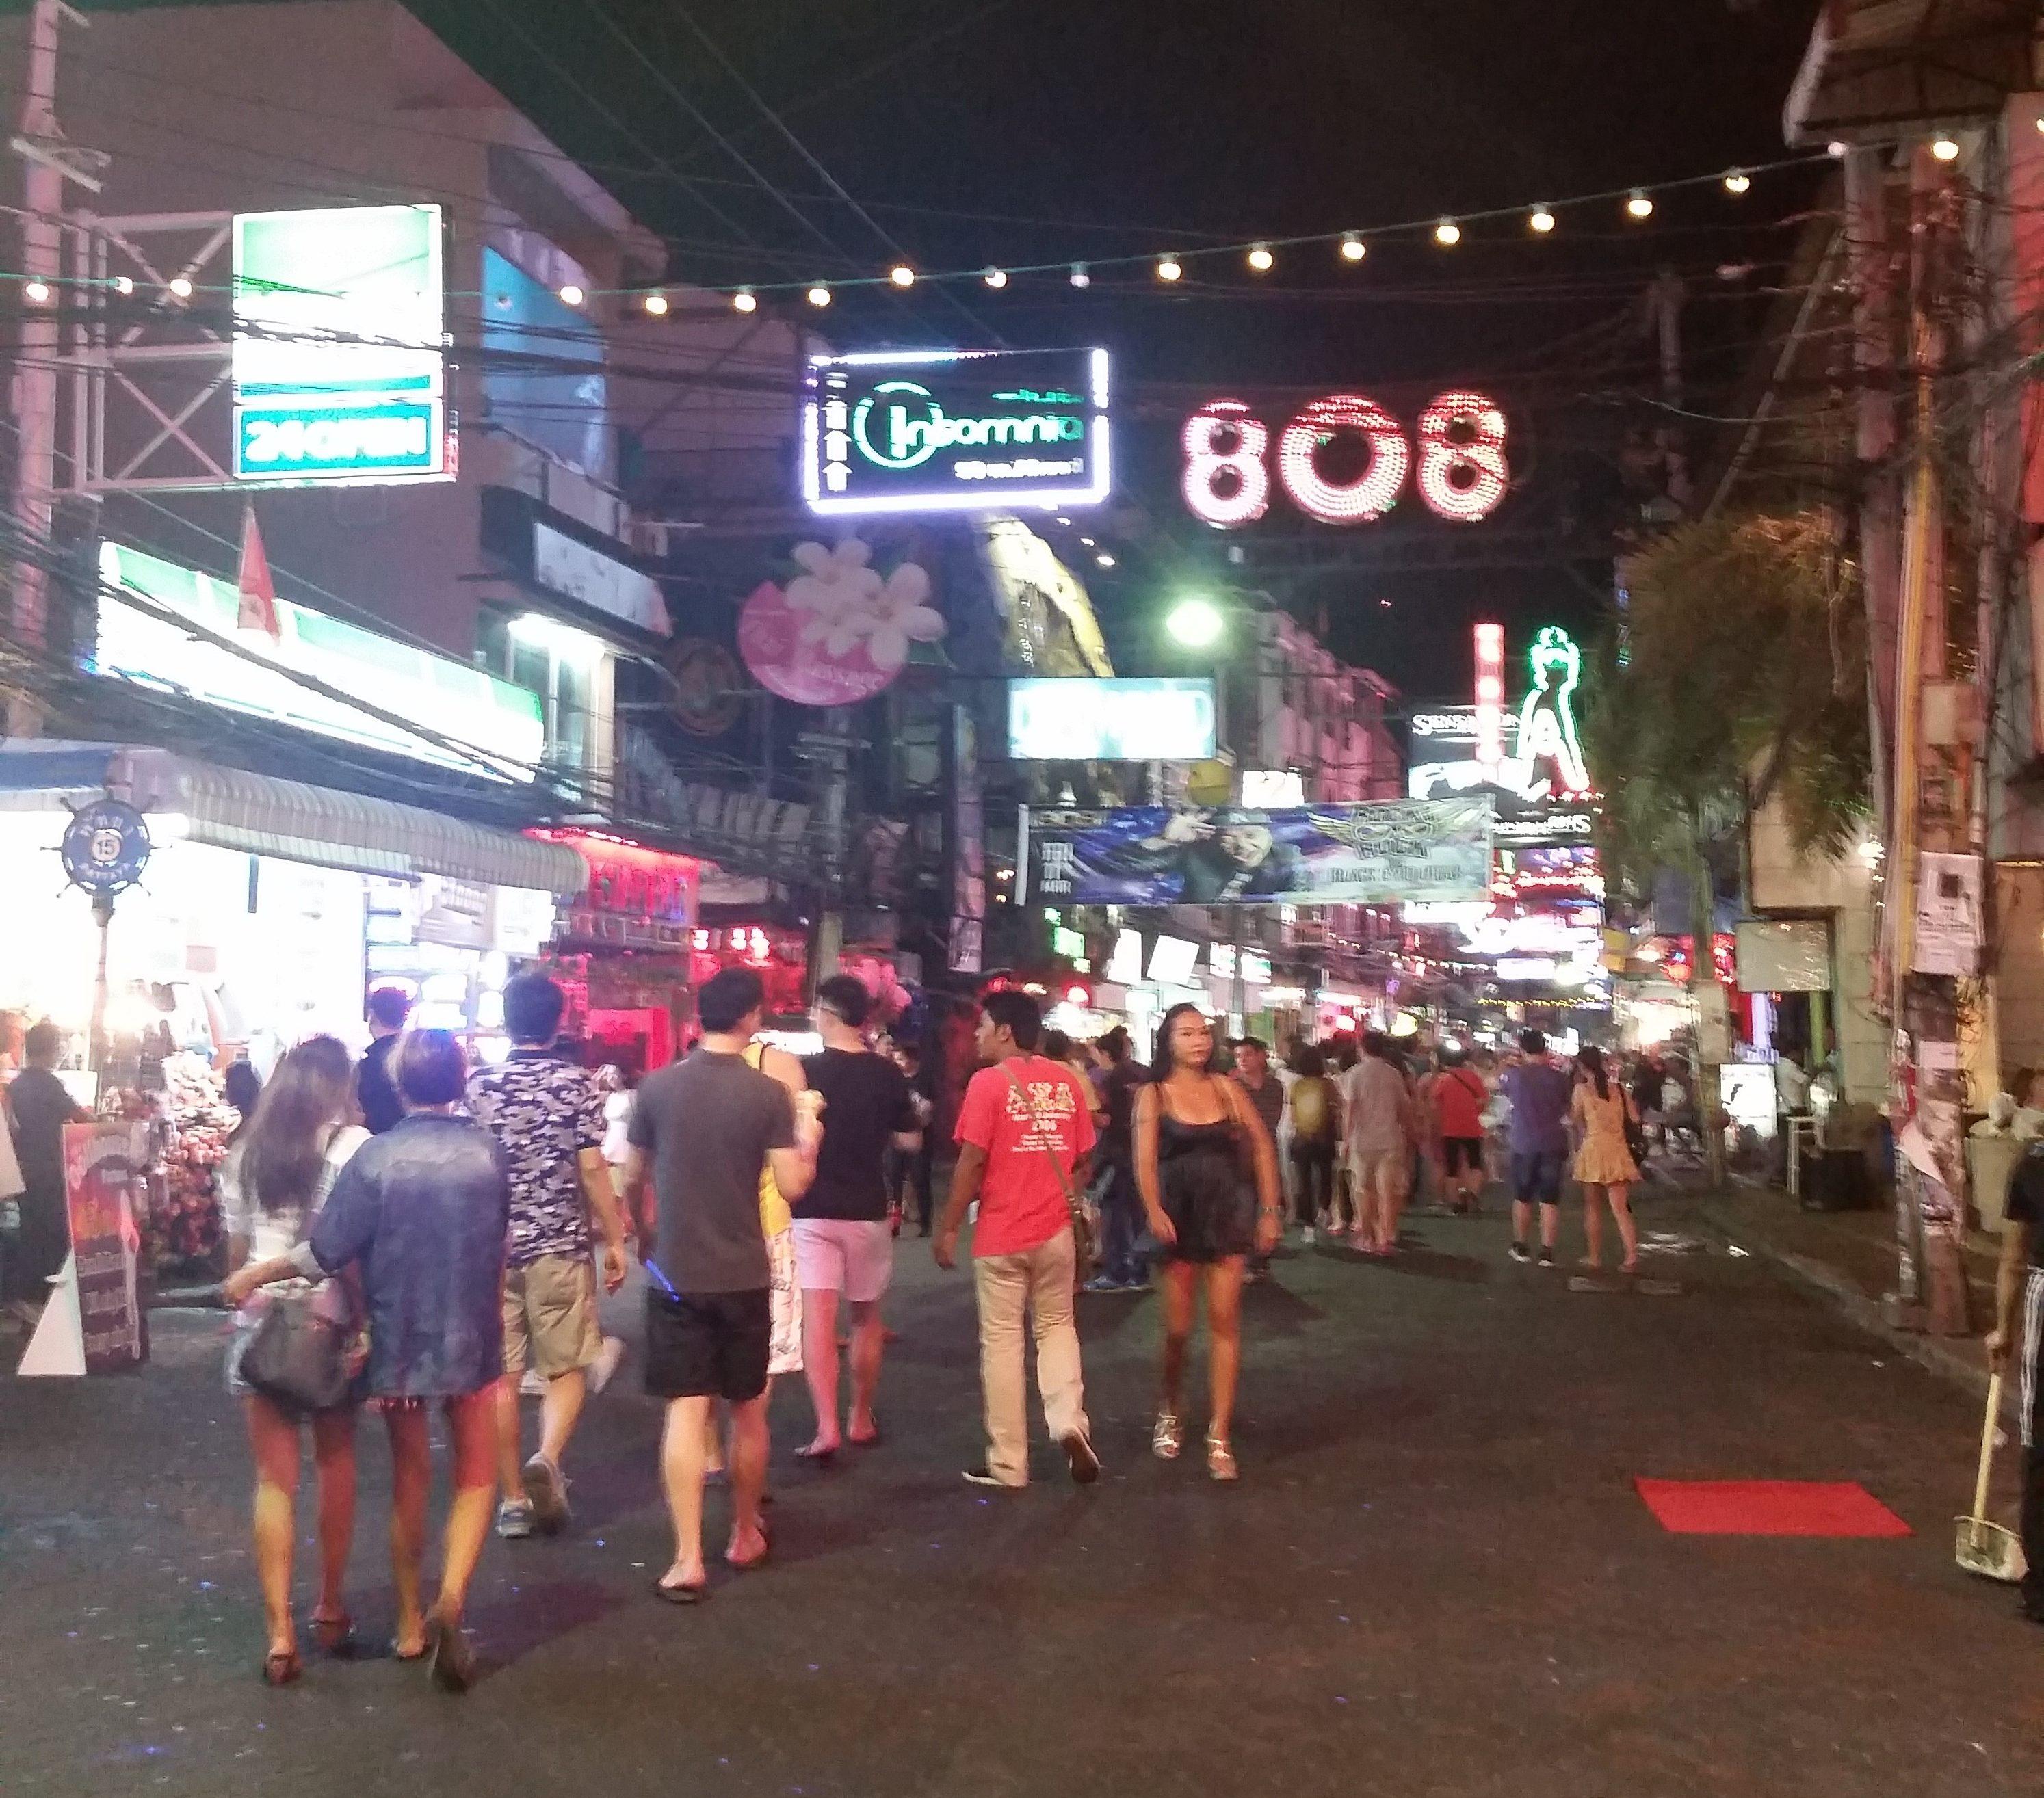 20160321 204602 e1507525259503 - Walking Street Pattaya TH